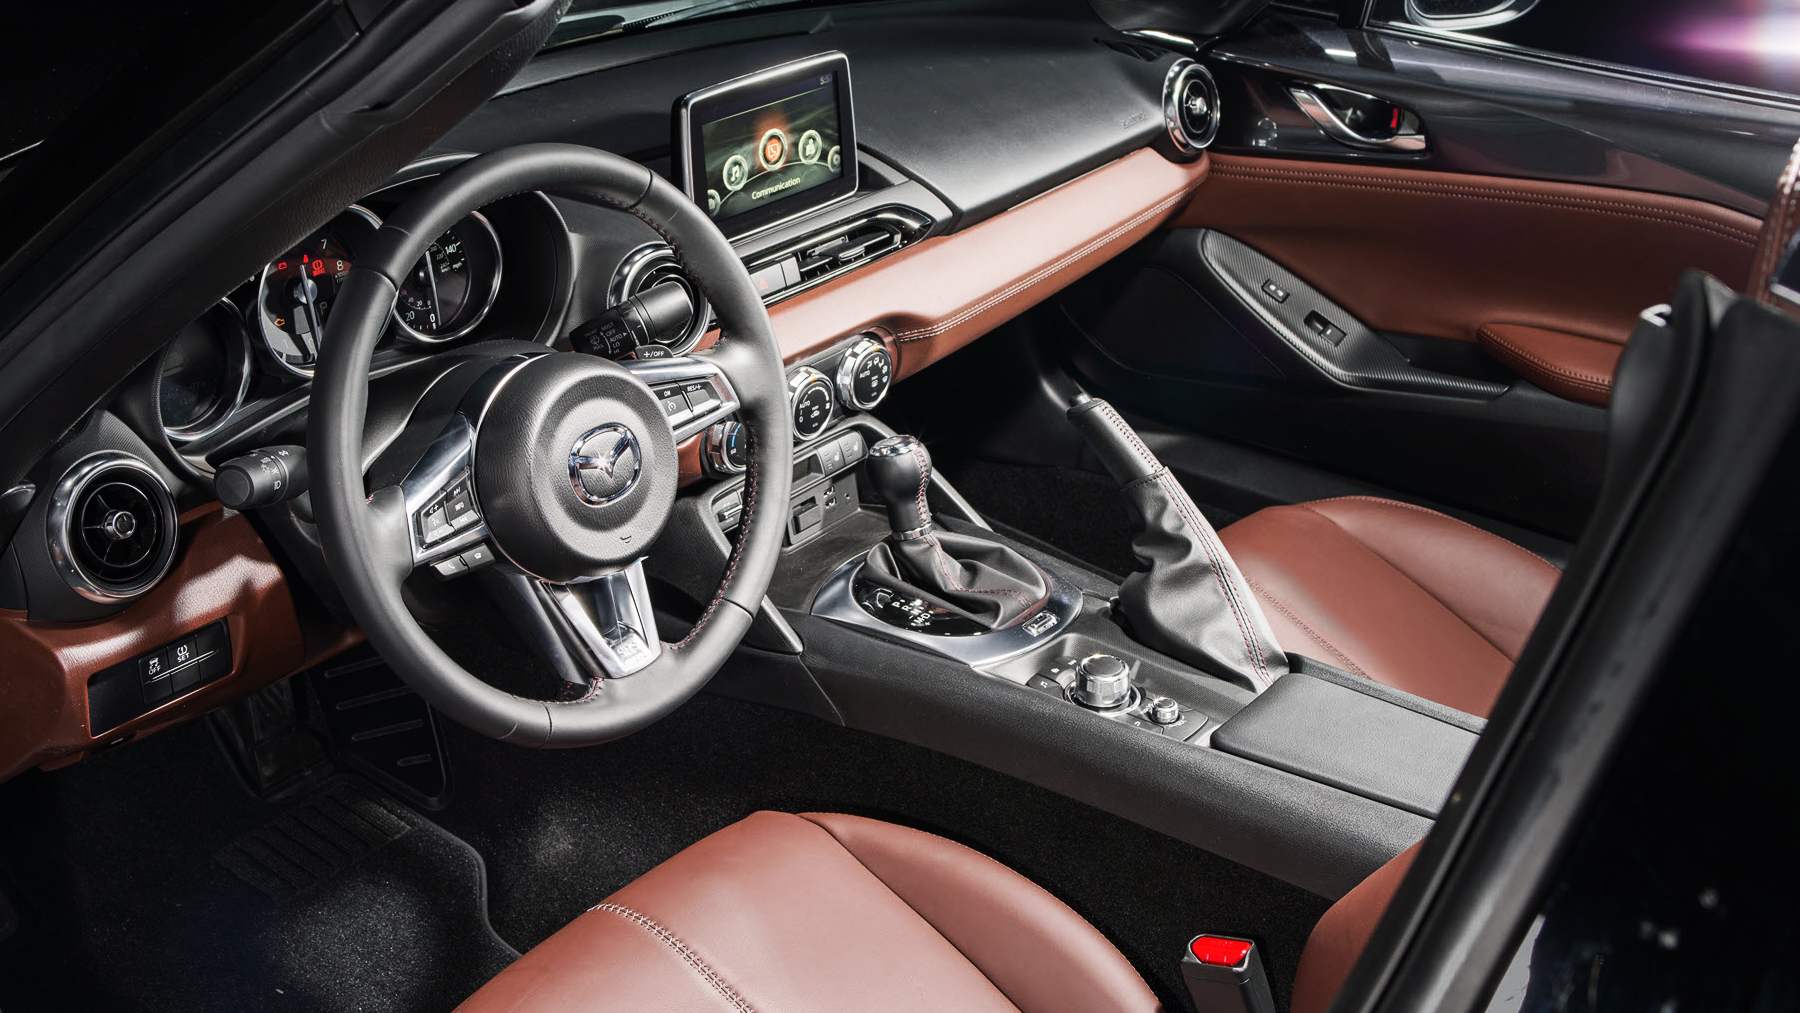 2017 Mazda Miata Price >> 2017 Mazda MX-5-Miata RF - View Pictures & Videos | Mazda USA